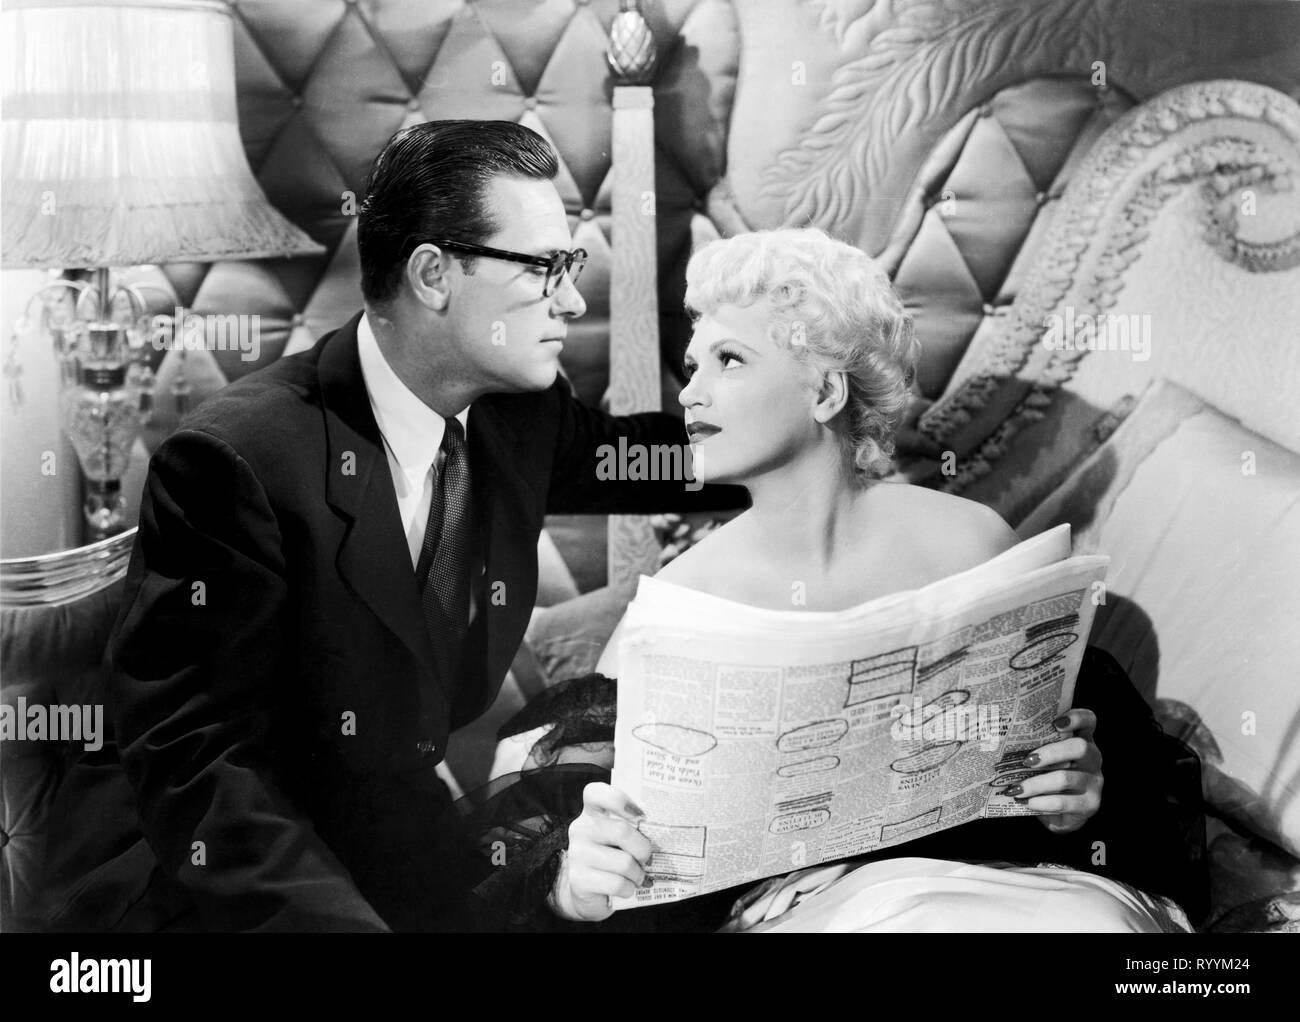 WILLIAM HOLDEN, JUDY HOLLIDAY, BORN YESTERDAY, 1950 - Stock Image